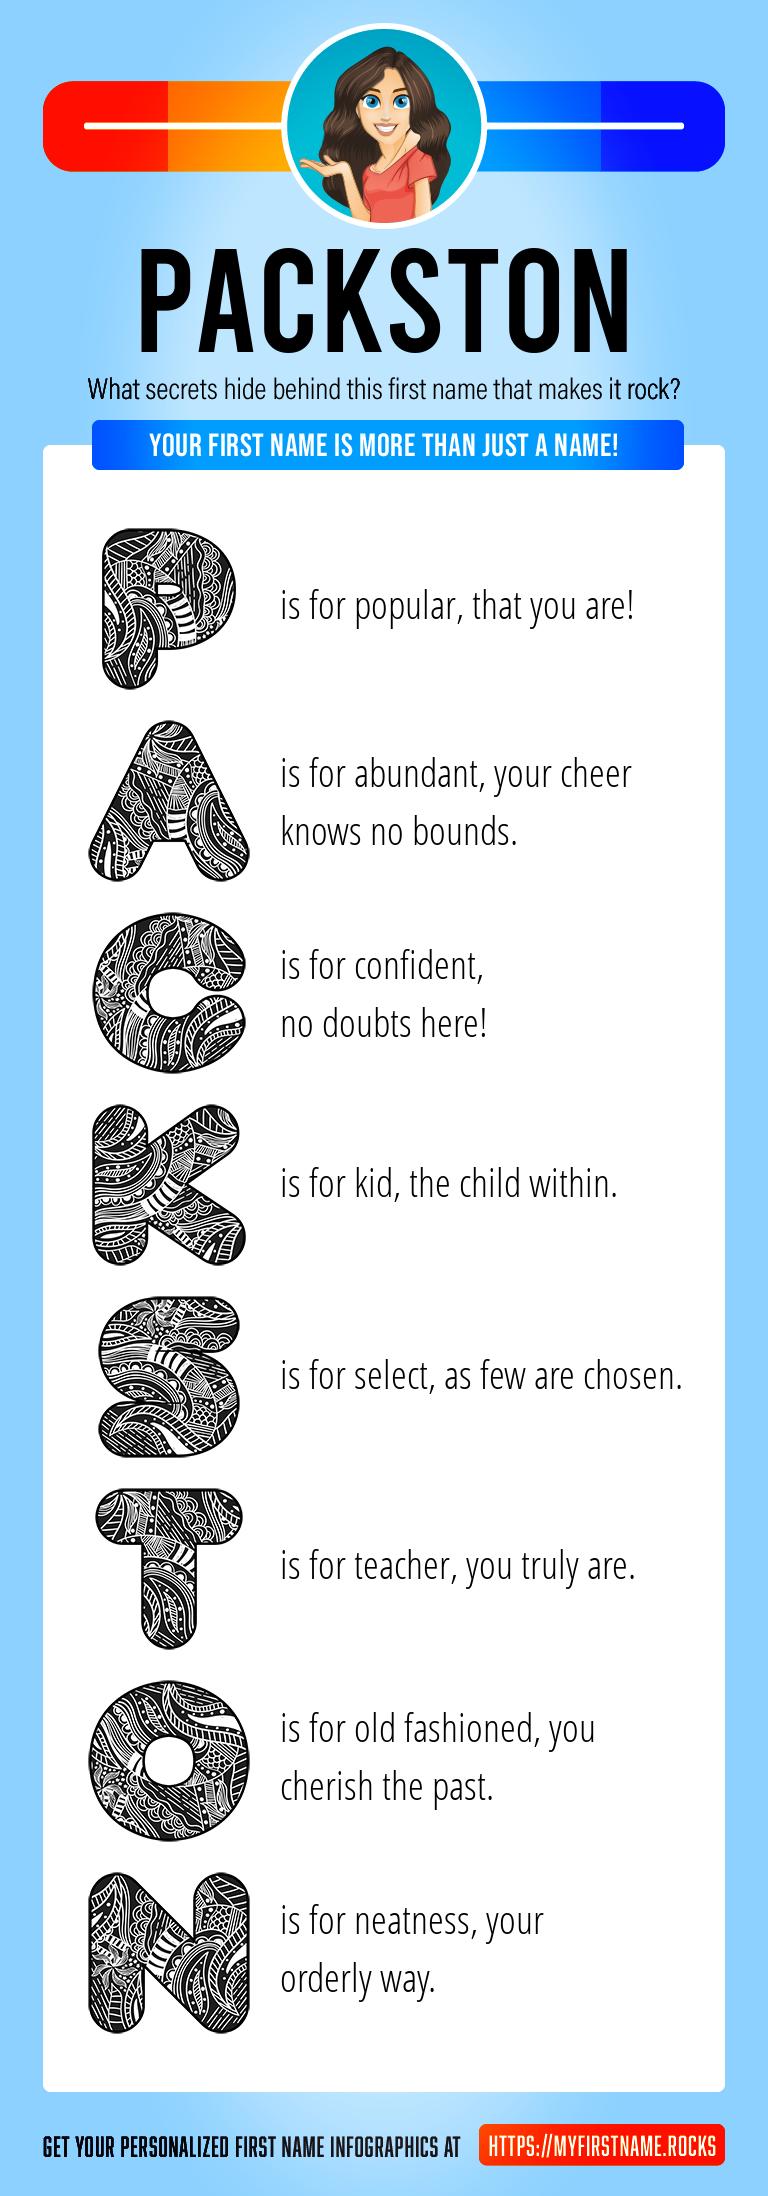 Packston Infographics